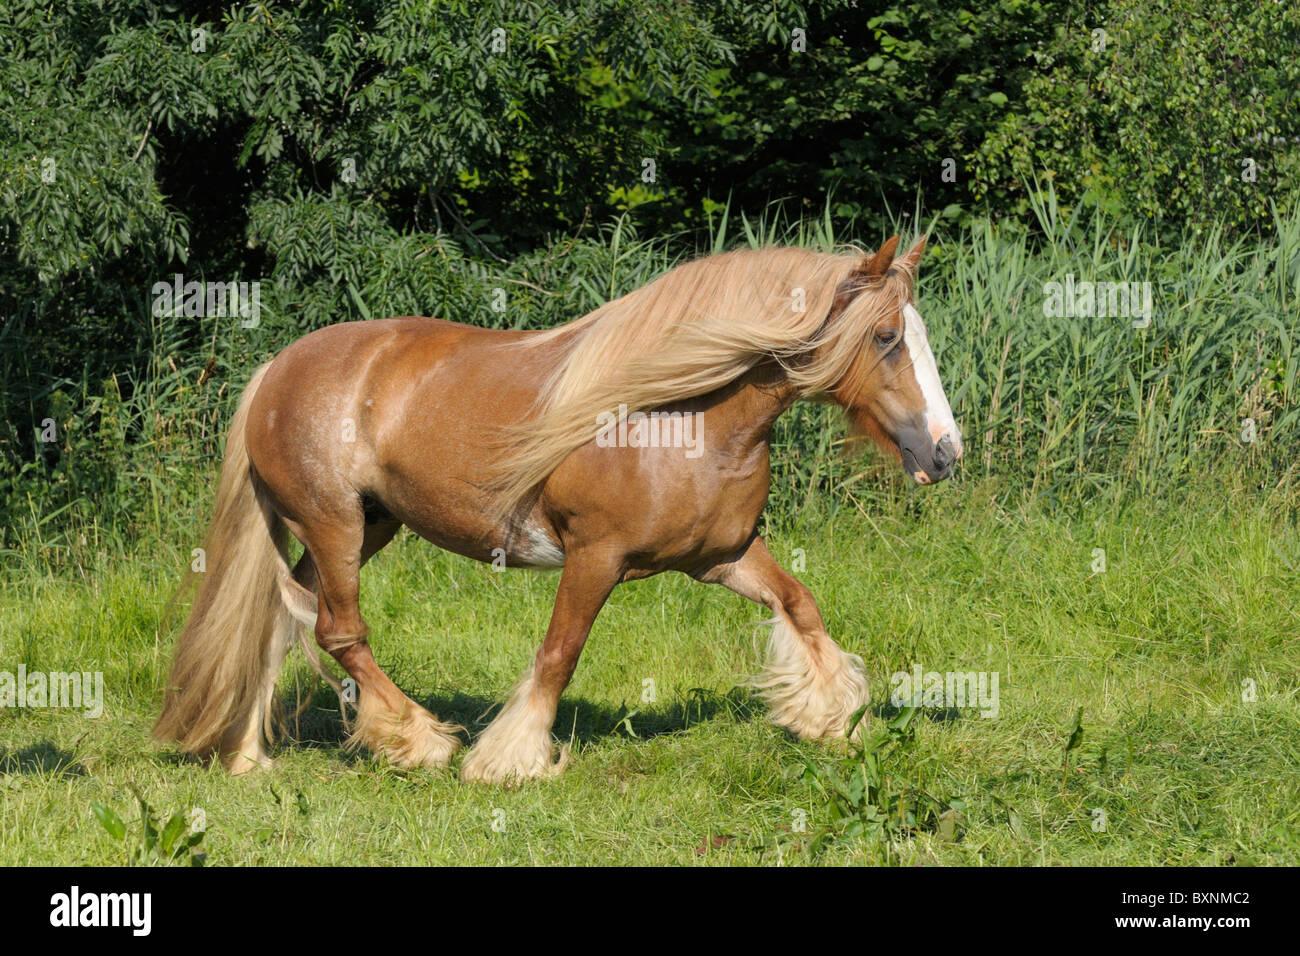 Irish Tinker horse trotting in the field - Stock Image